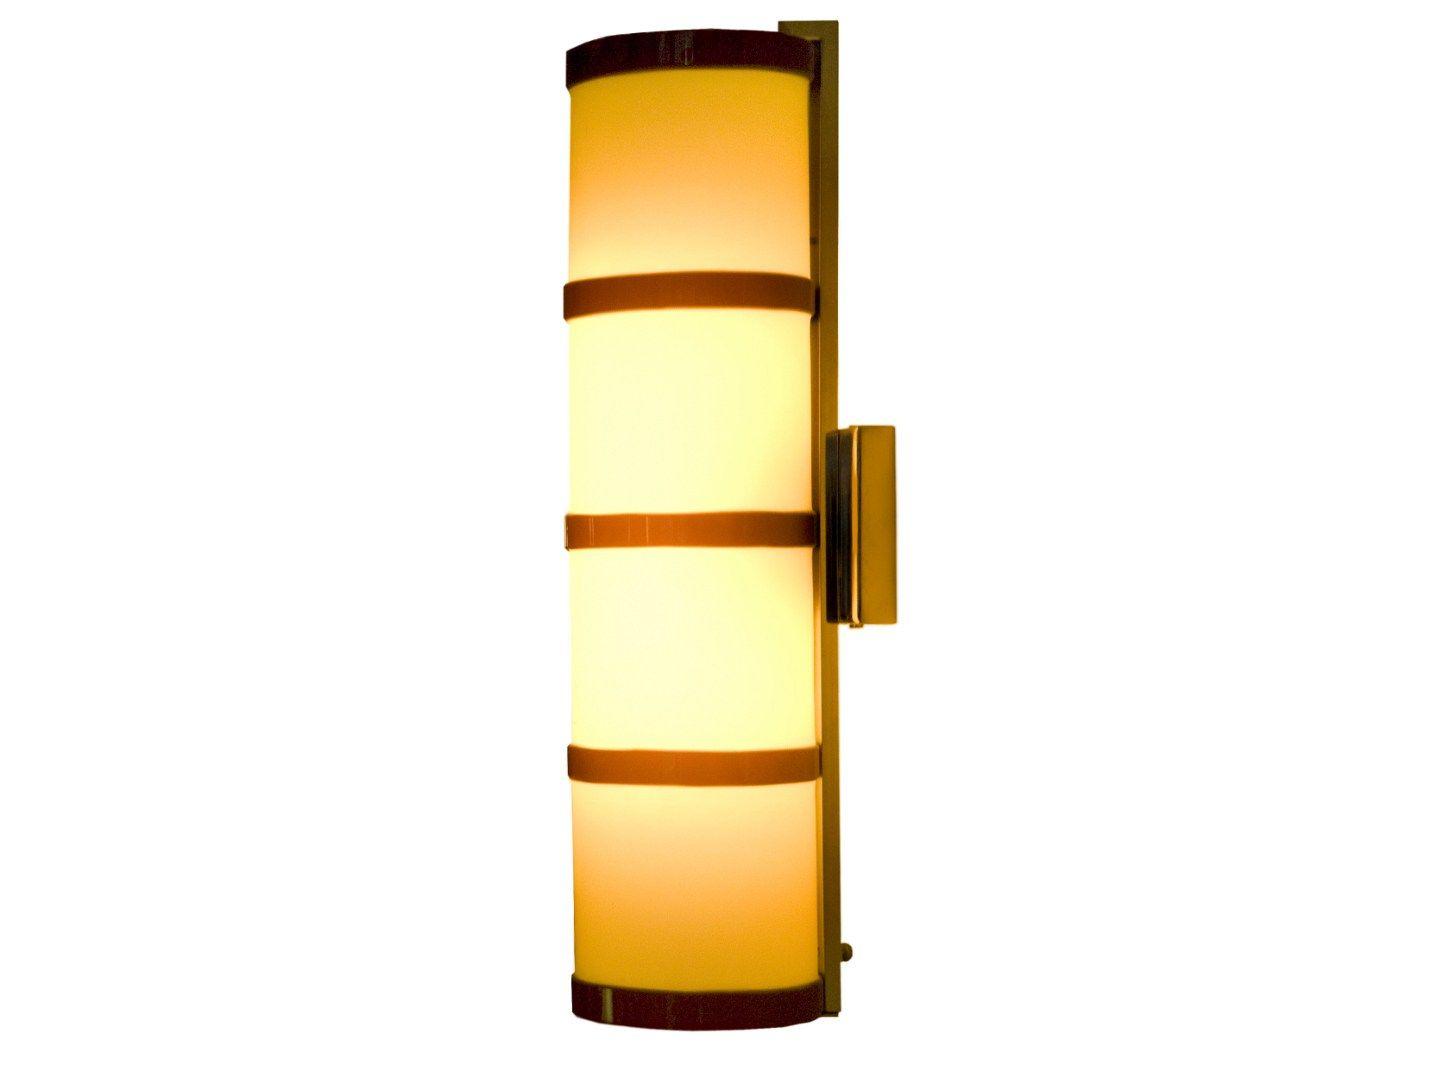 MURANO GLASS WALL LIGHT MURENE COLLECTION BY VERONESE | DESIGN ...